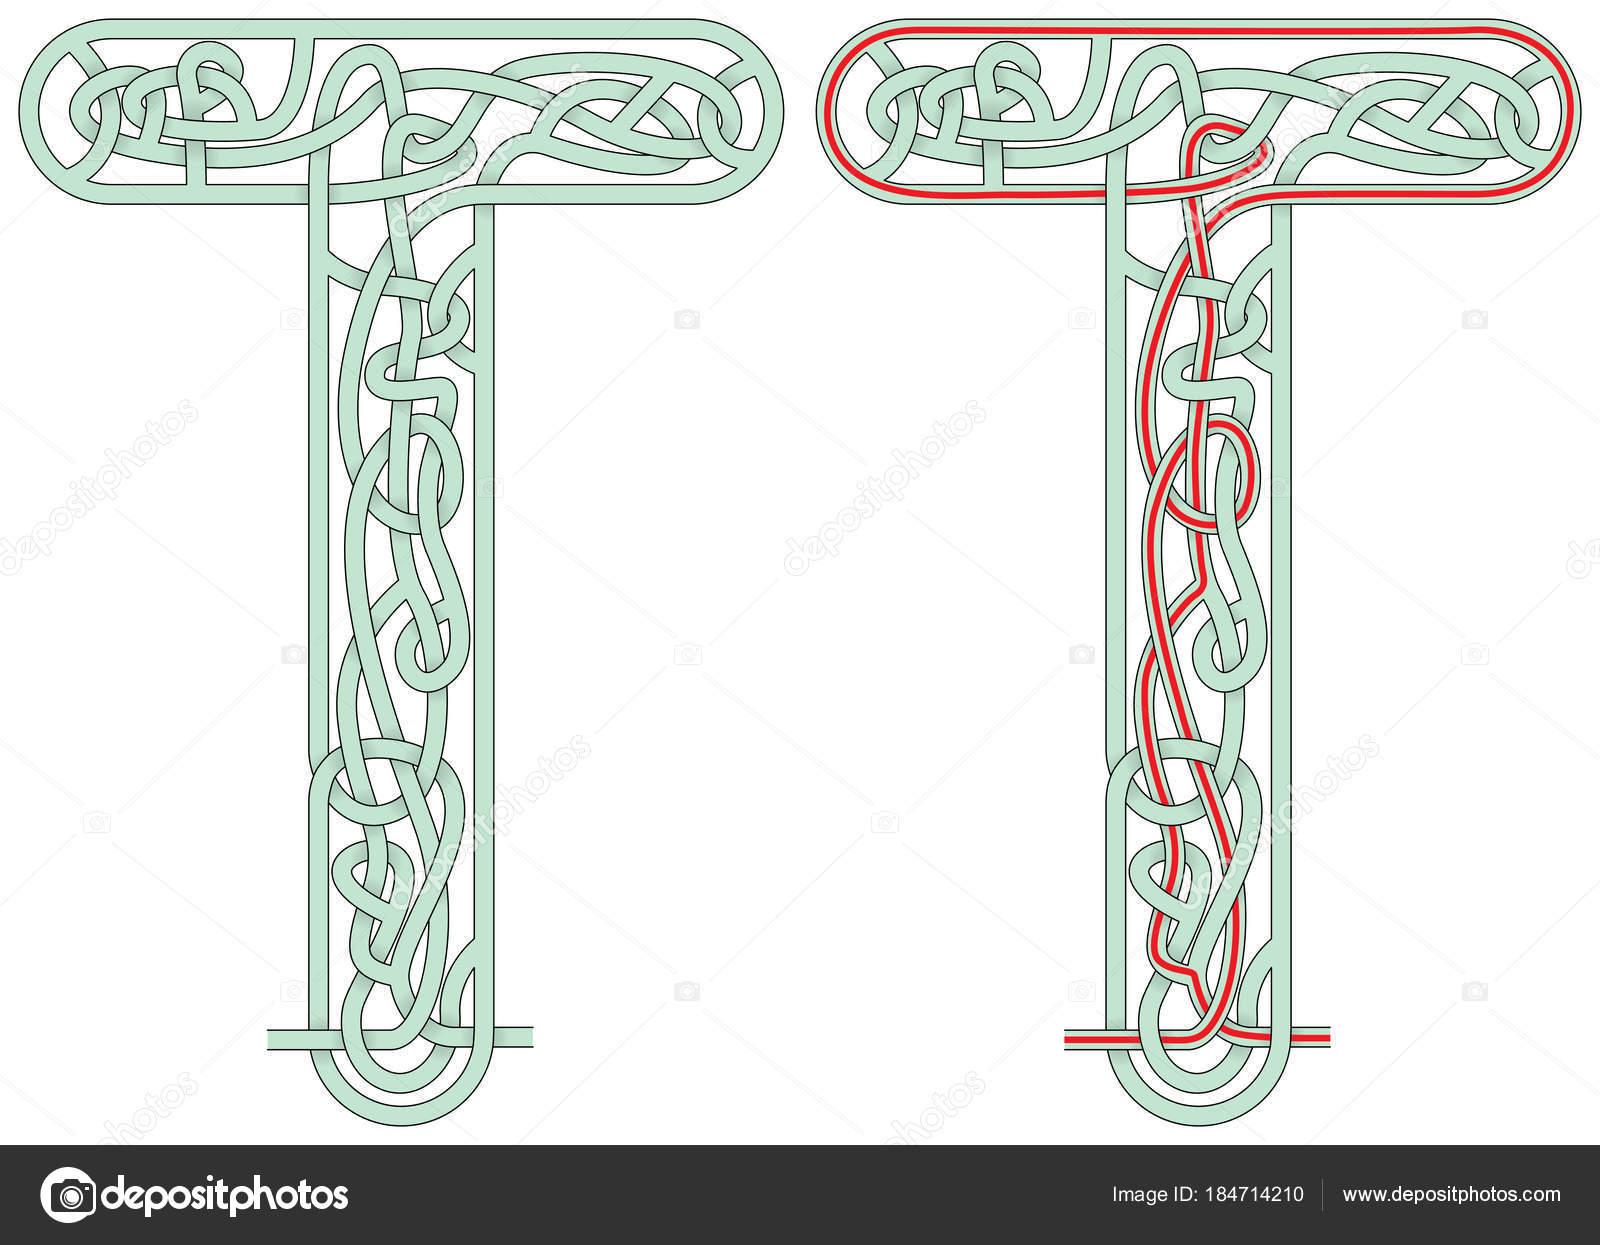 английский алфавит лабиринт